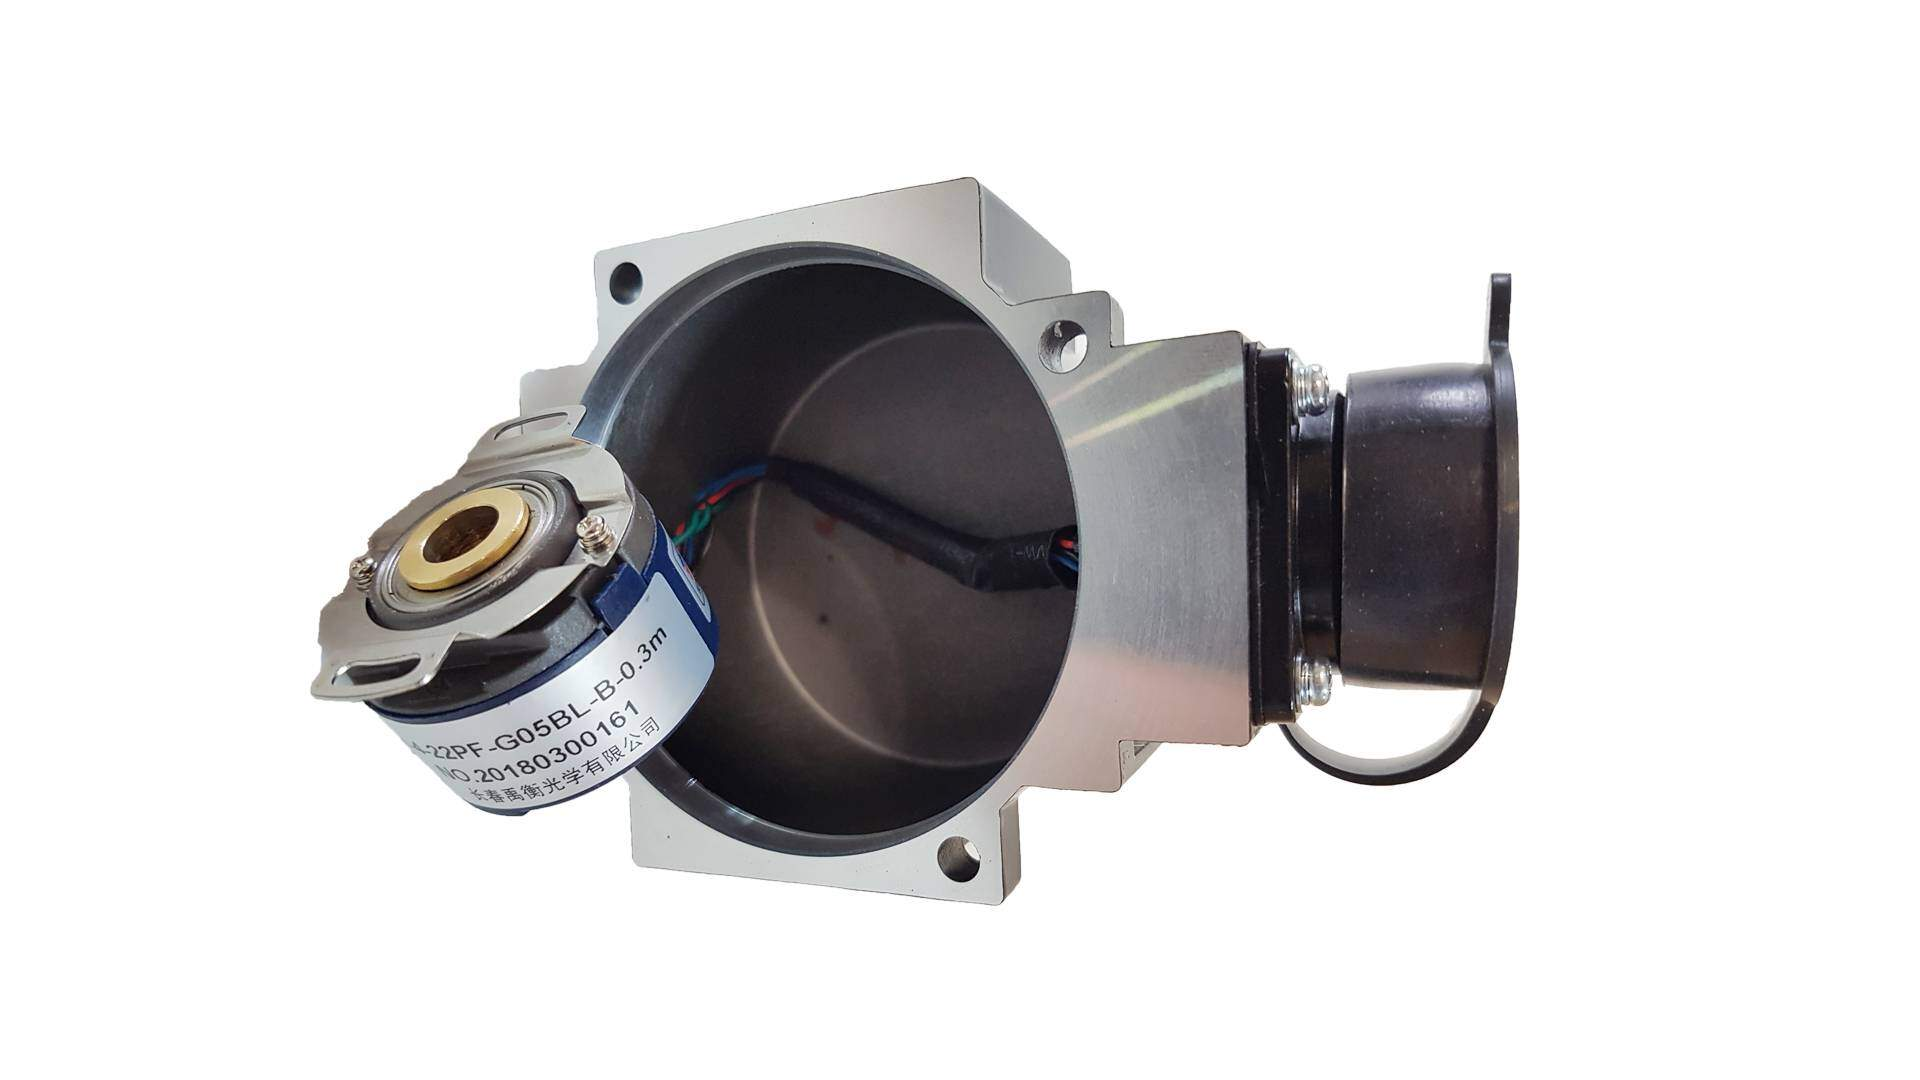 Biss-C encoder for MiGE motors - SimRacingBay edition